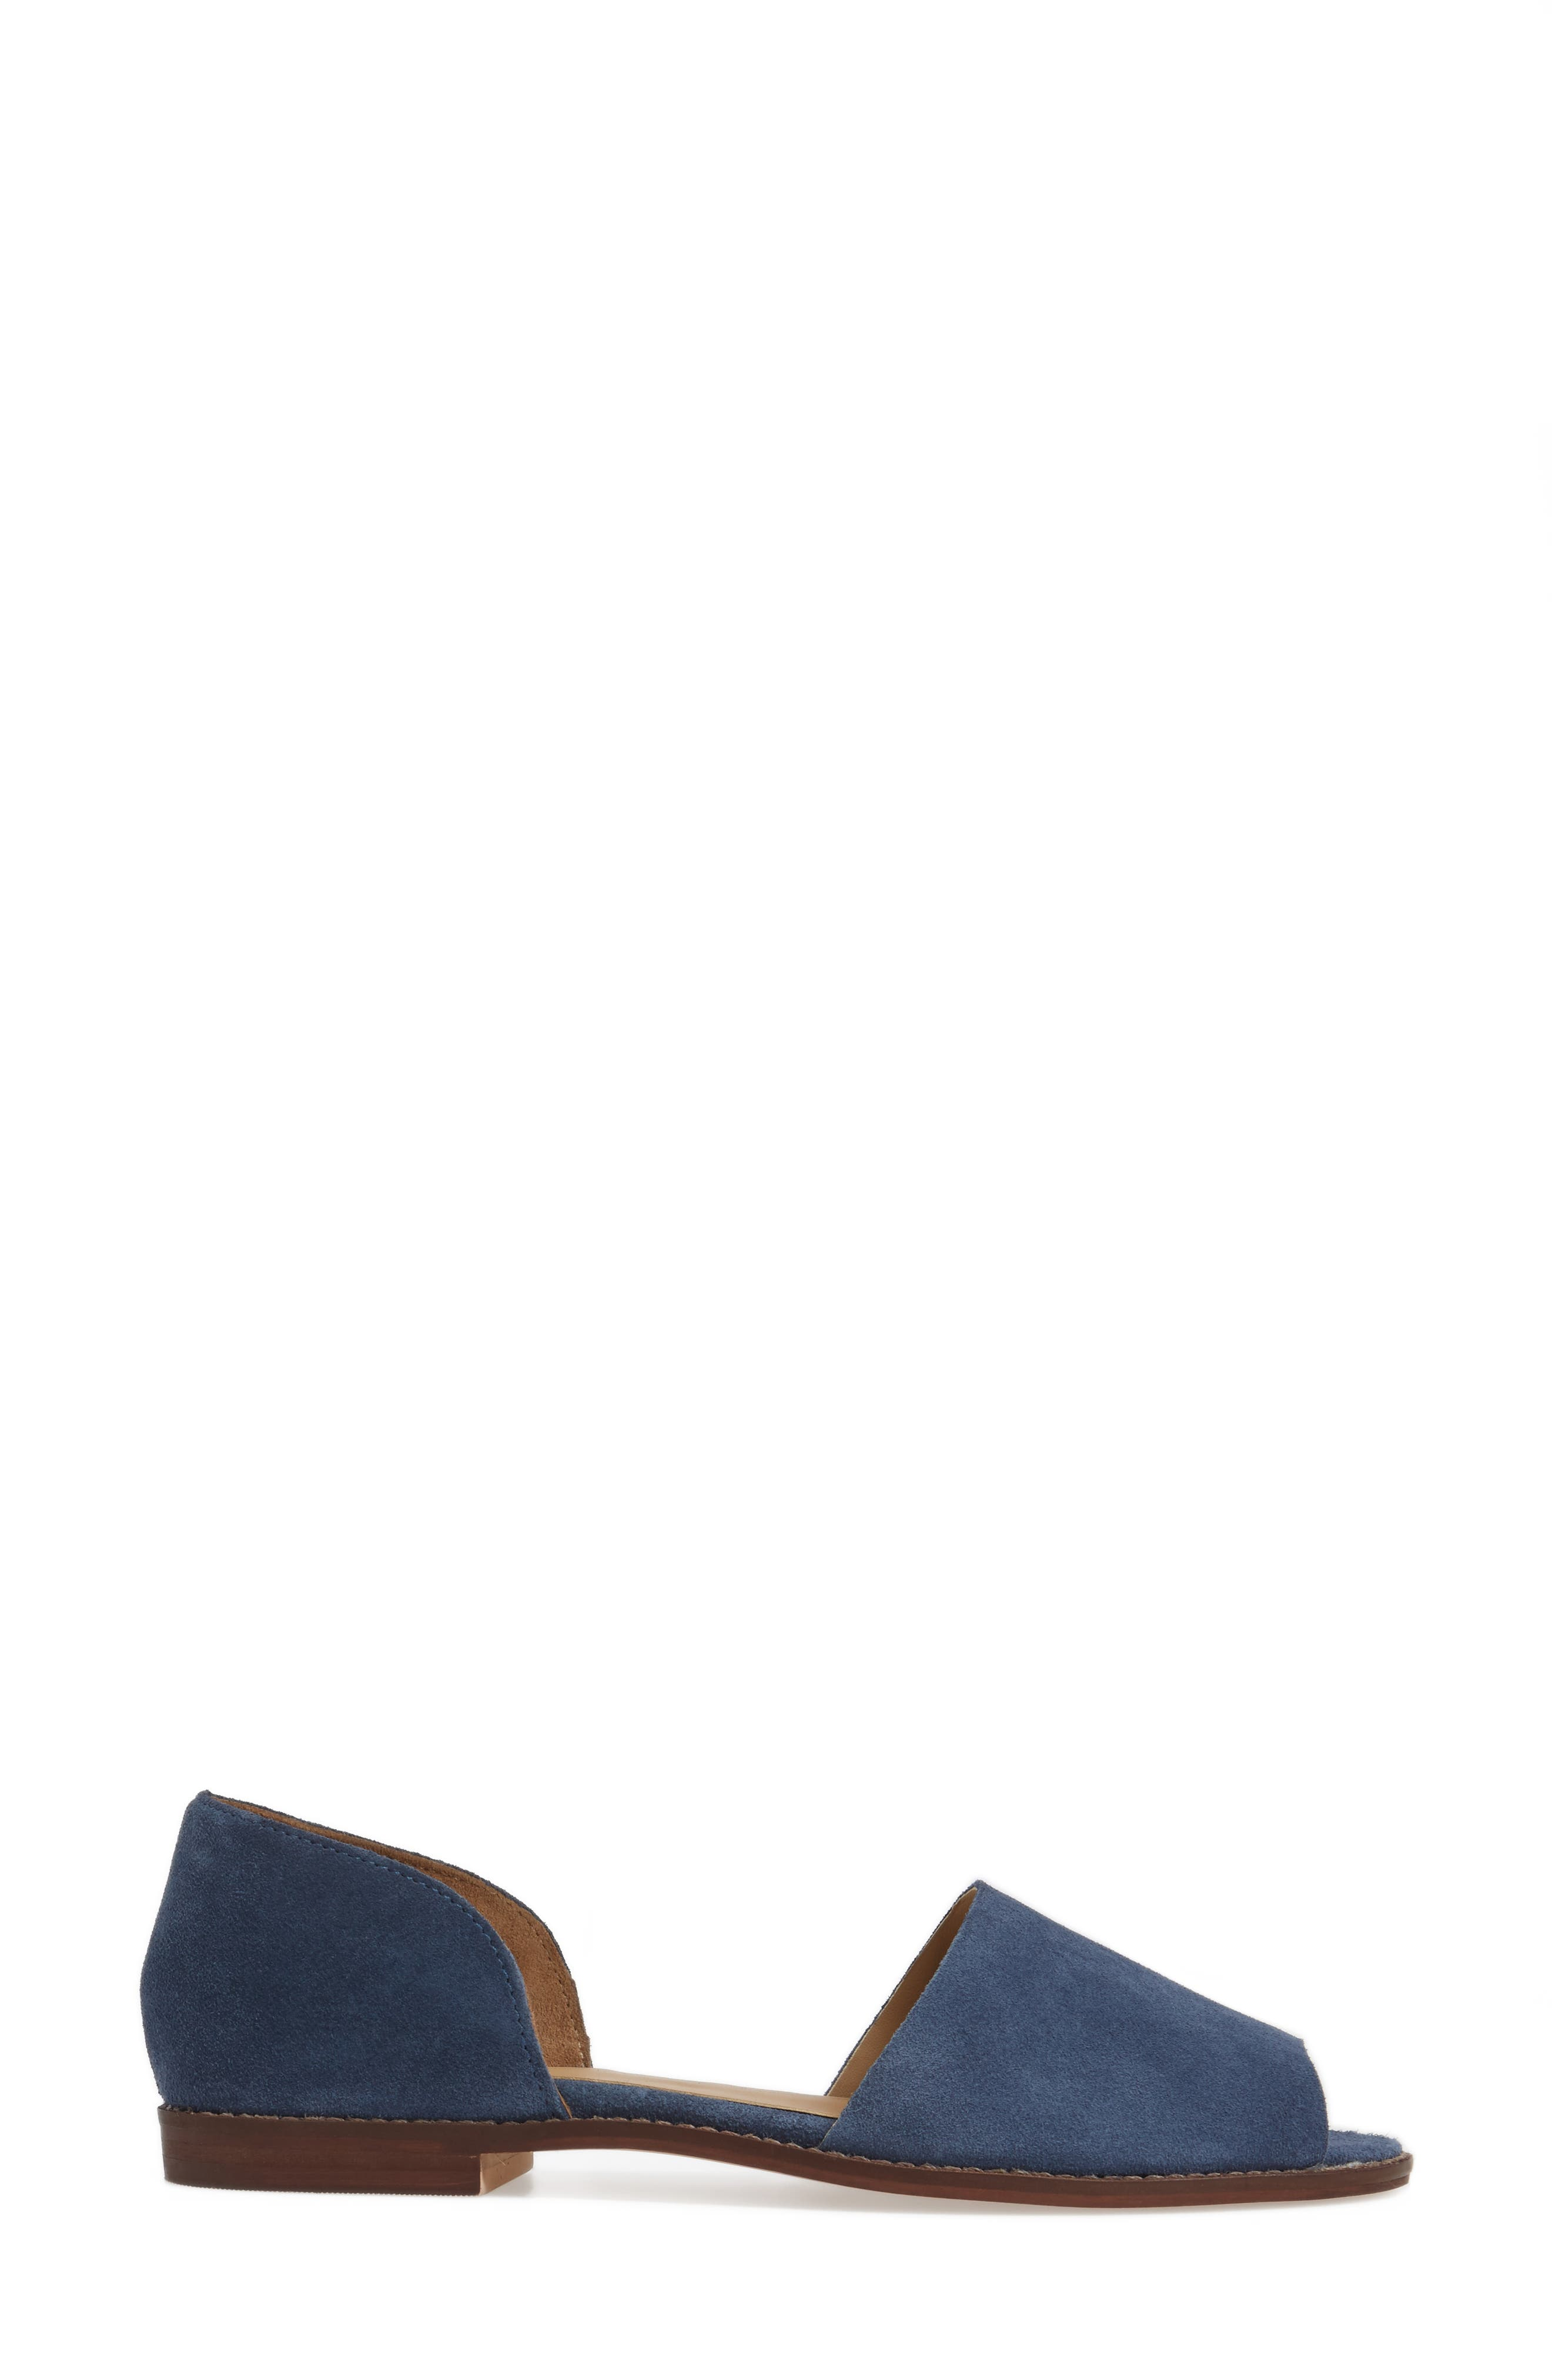 Alternate Image 3  - Topshop 'Once' Peep Toe Flat (Women)